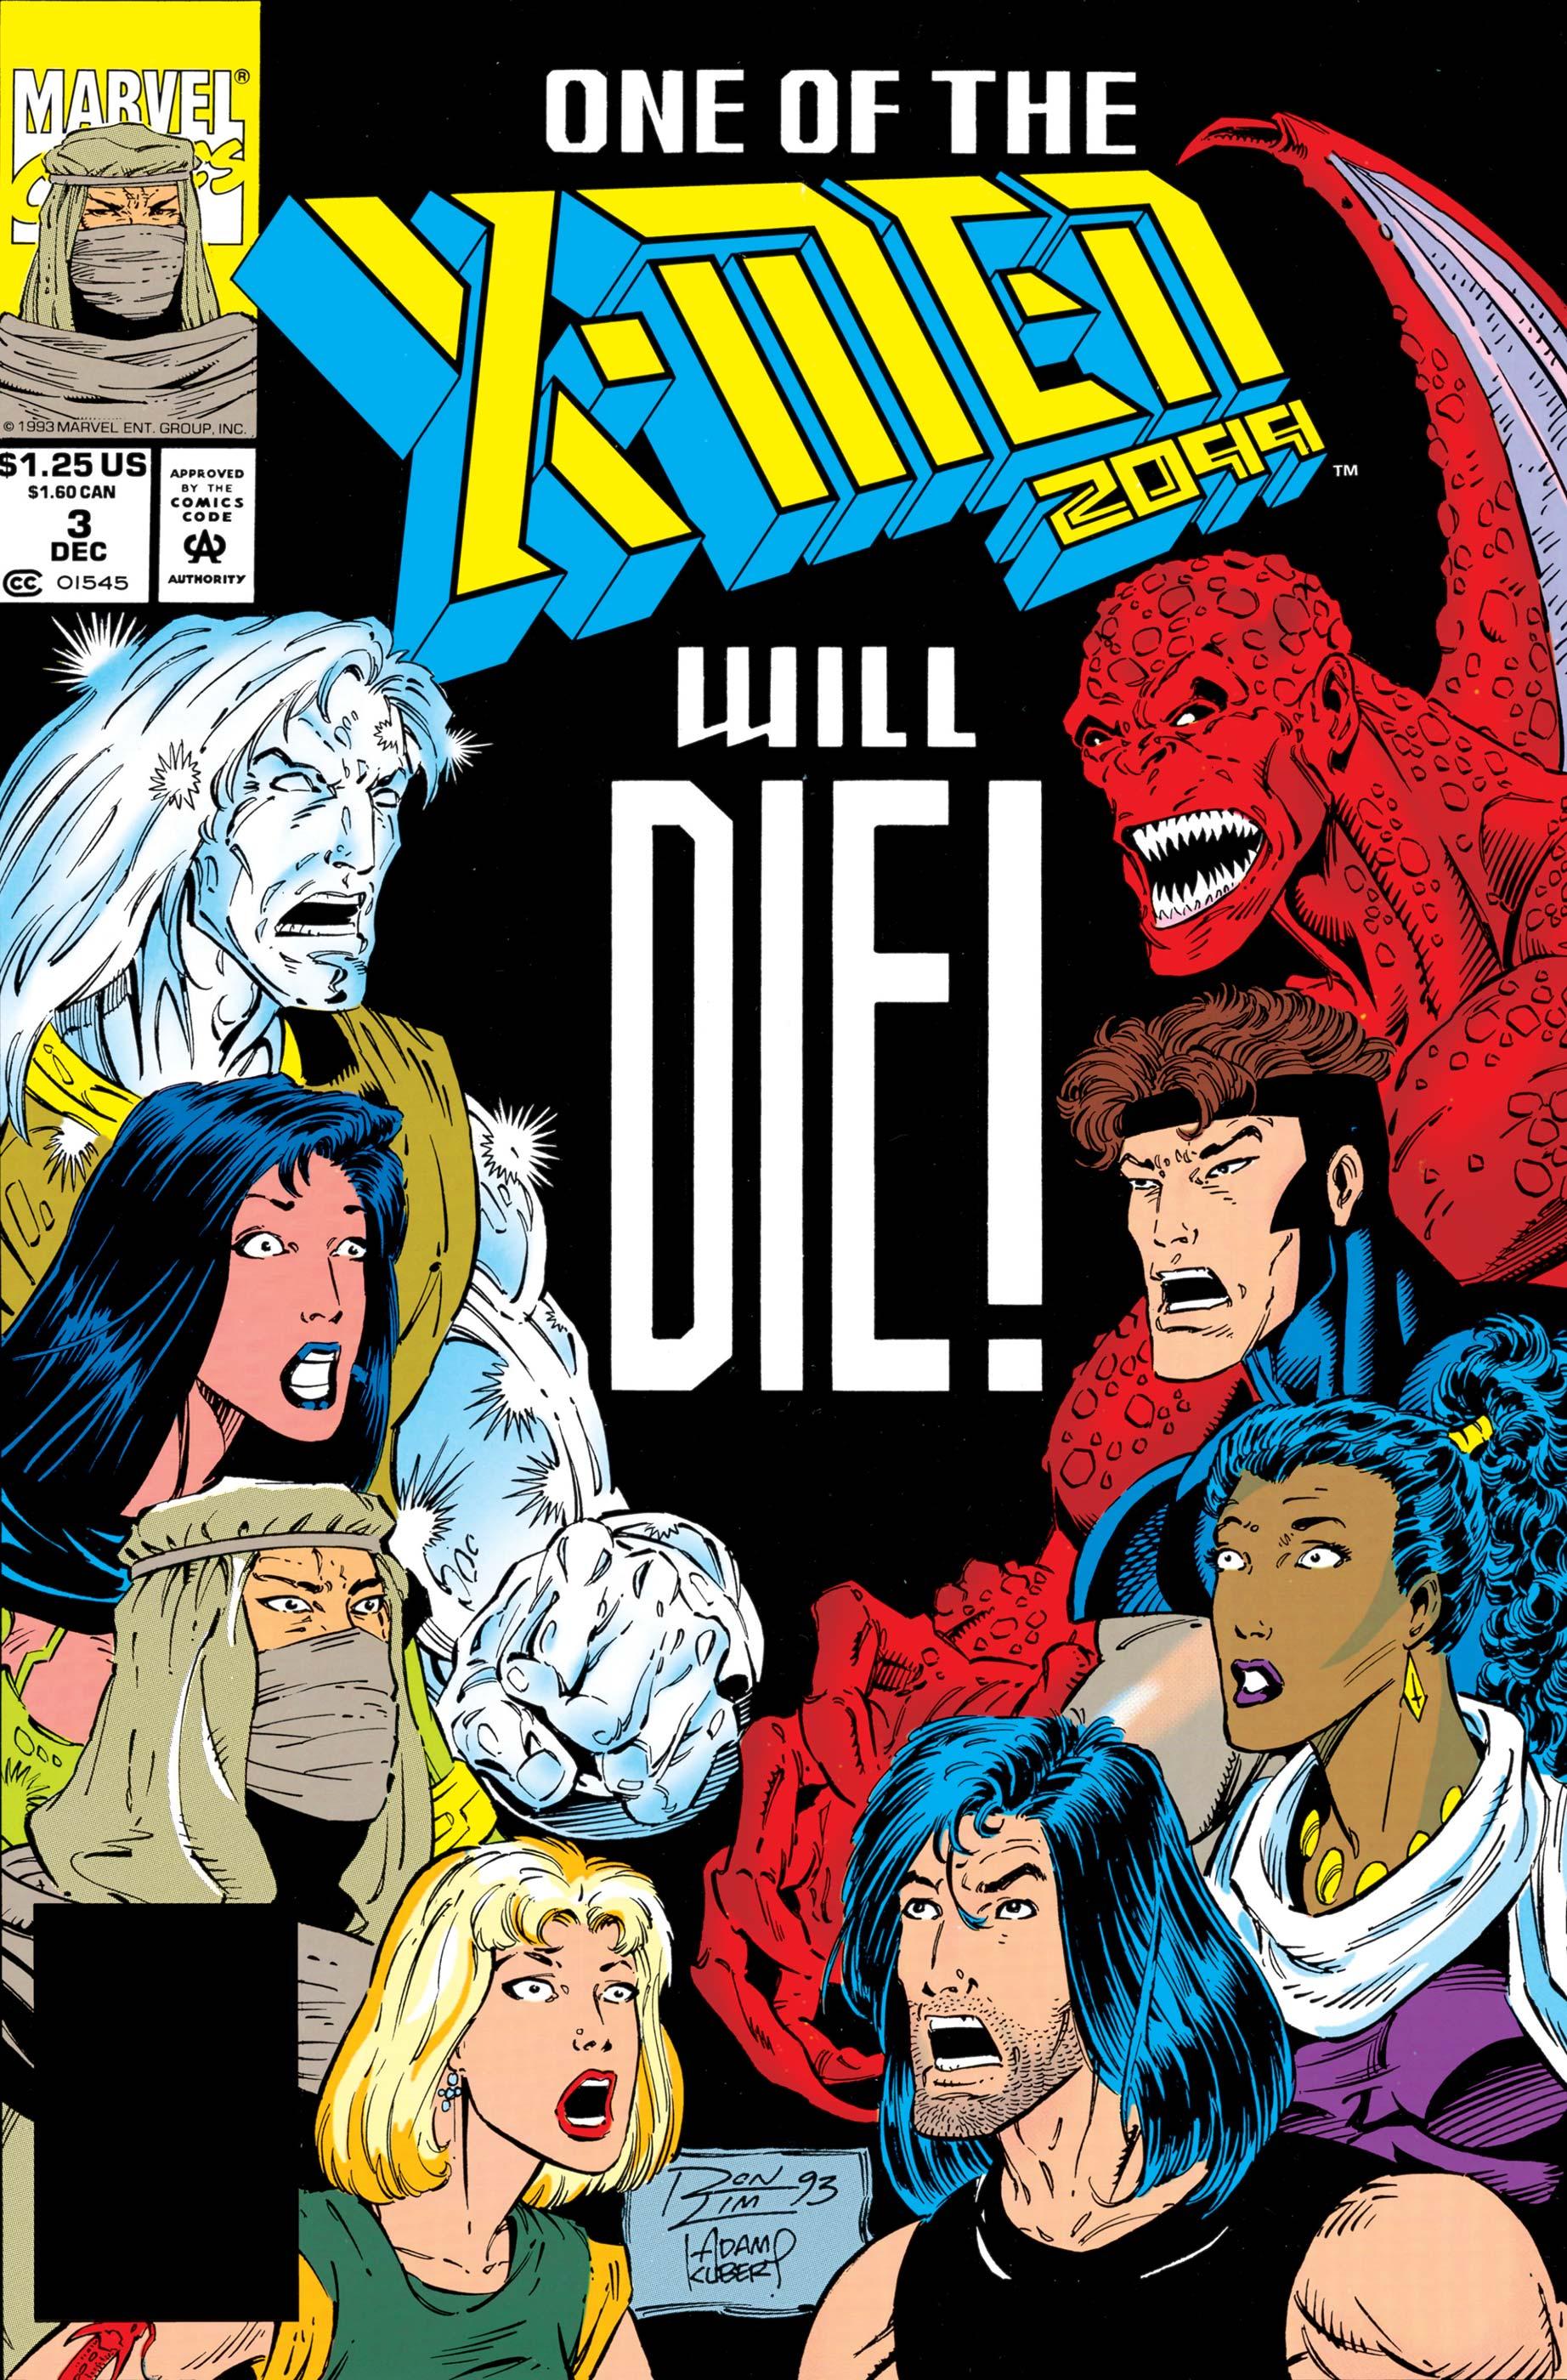 X-Men 2099 (1993) #3